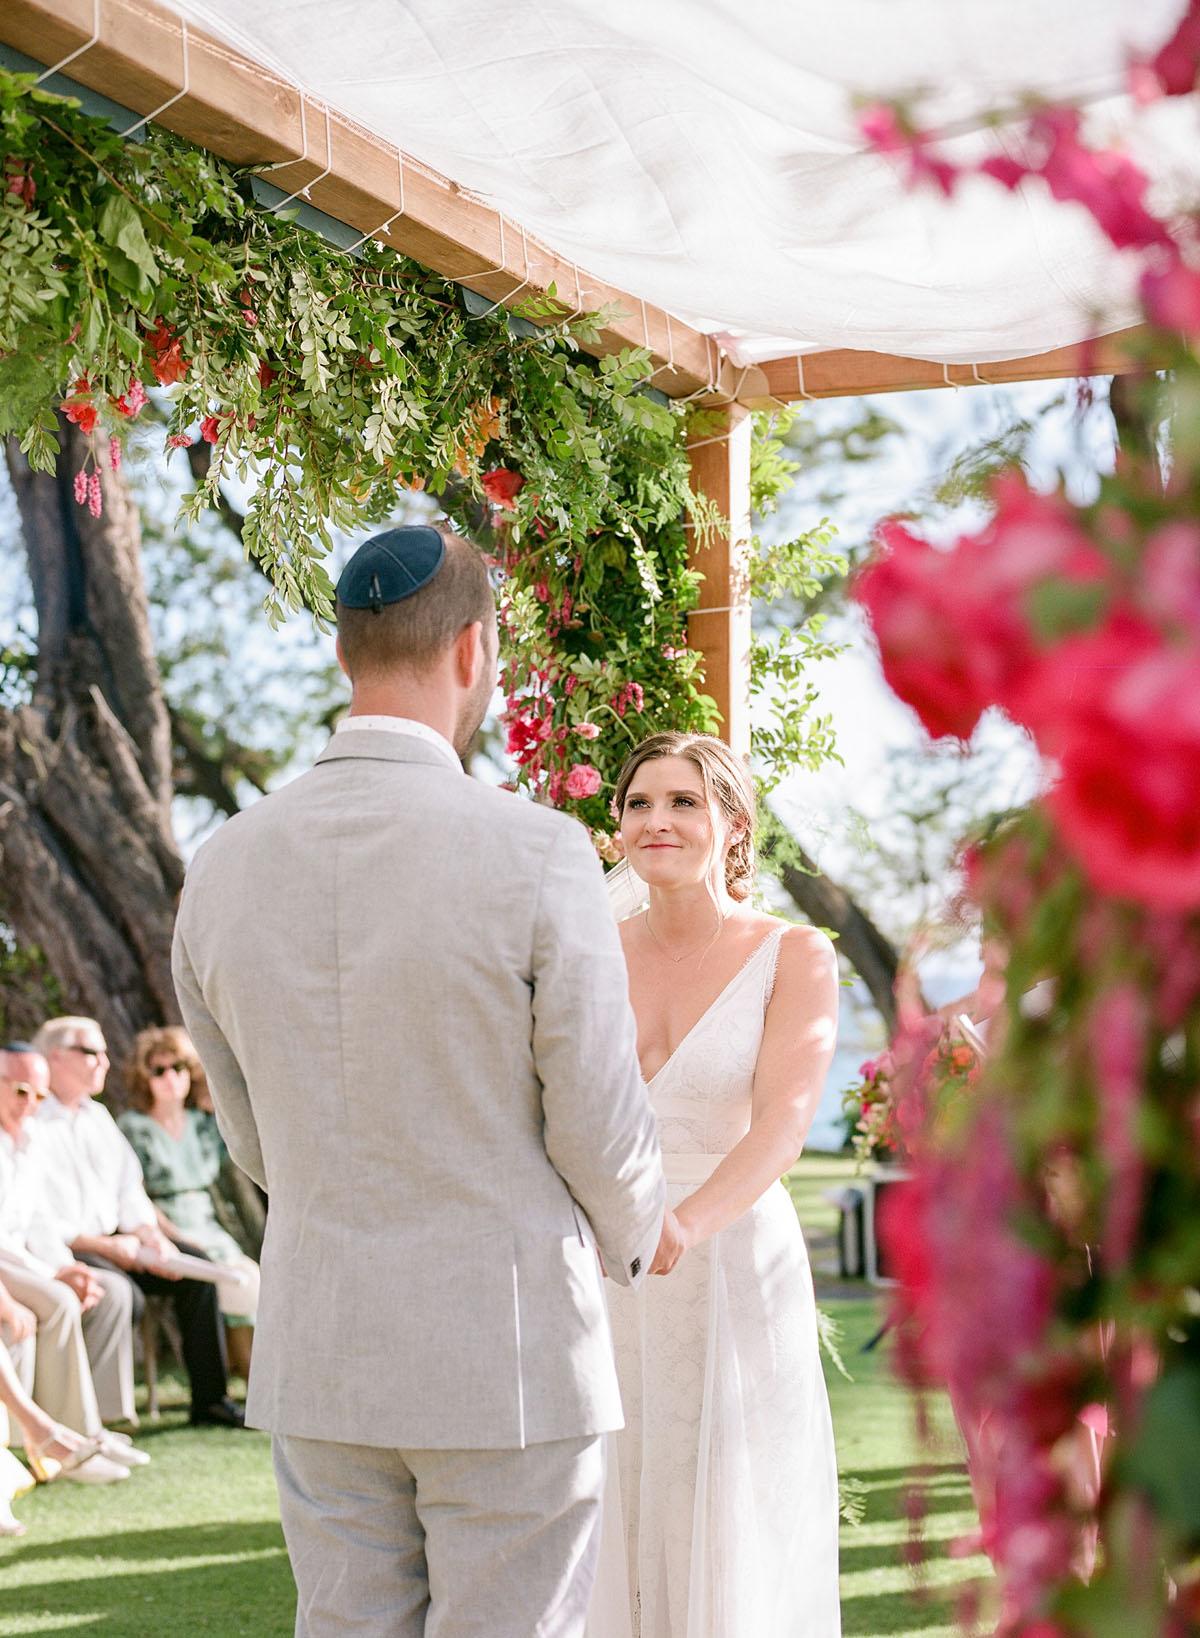 26-jewish-wedding-ceremony-maui.jpg